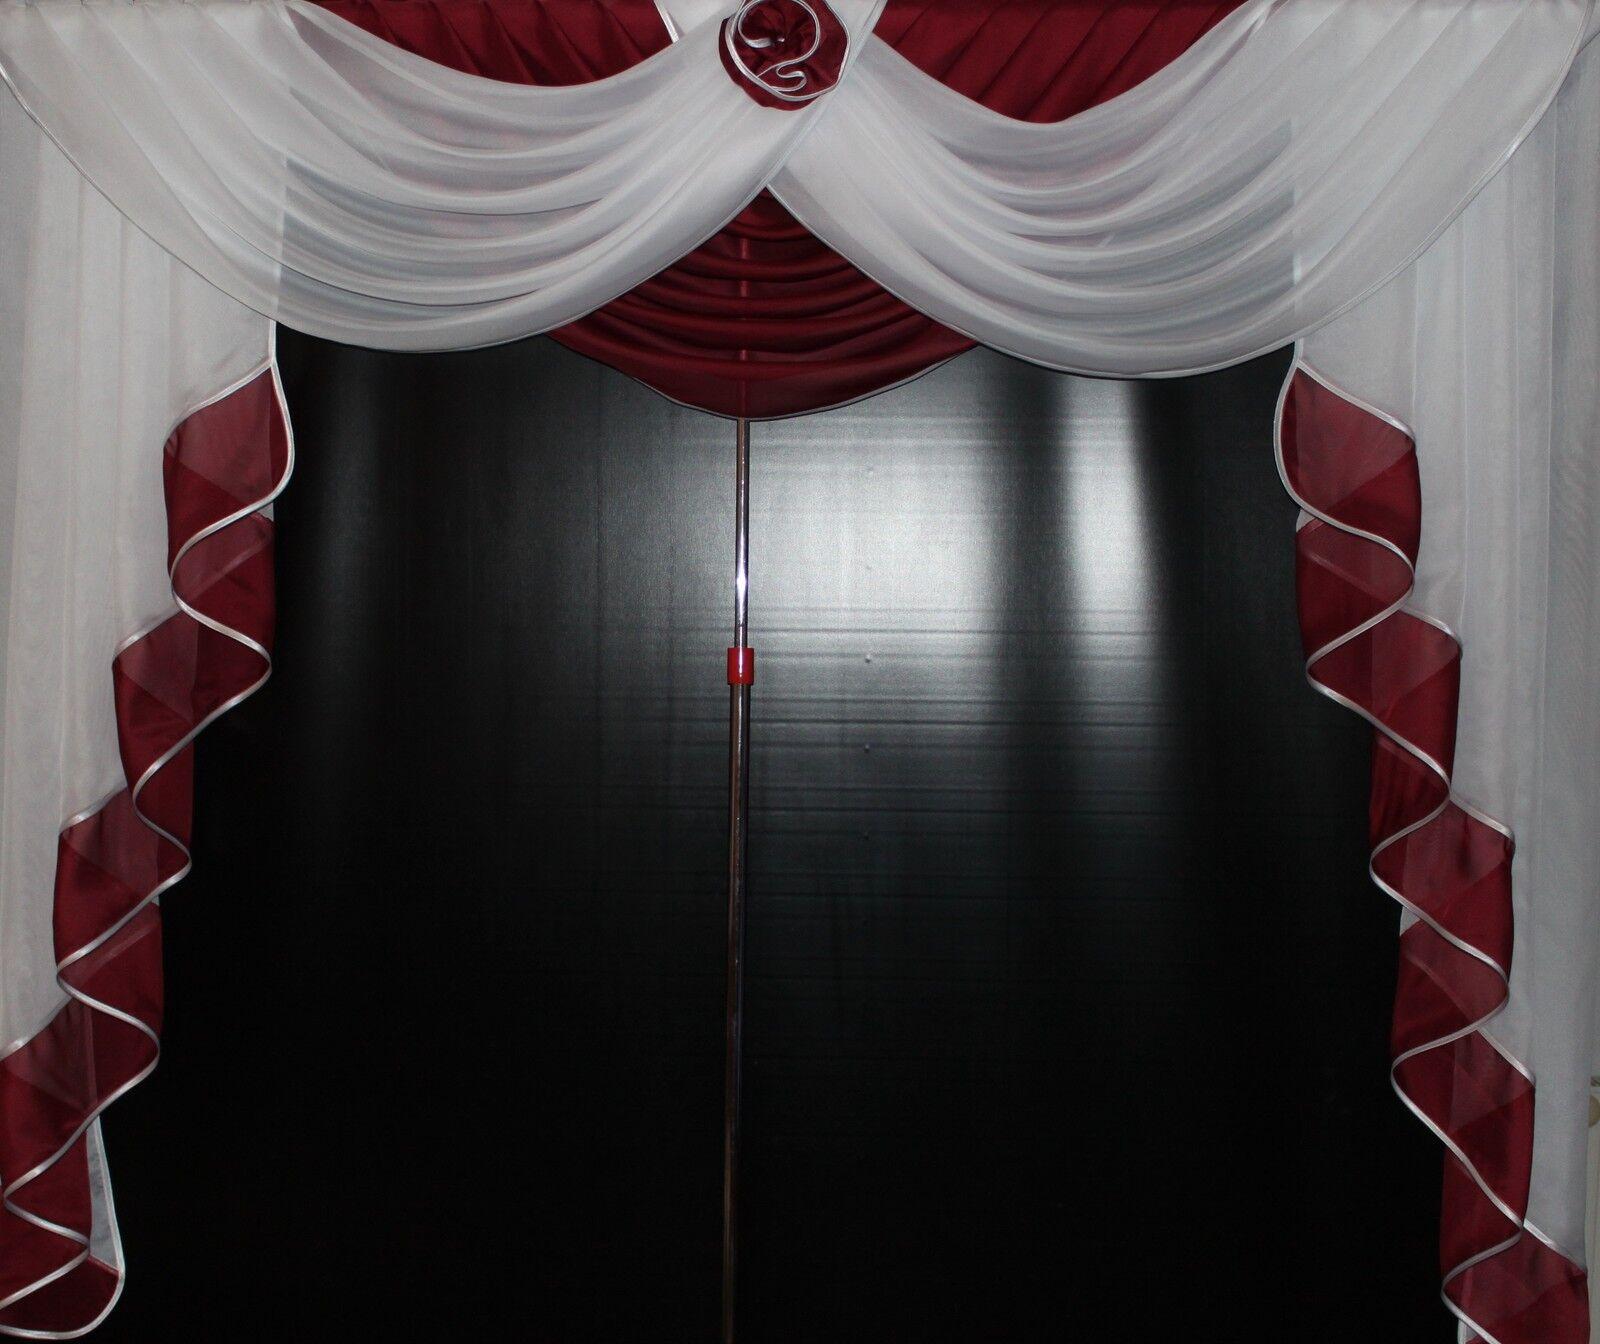 Deko - - - Gardine, Store, Vorhang in der Farbe  bordeaux   weiss | Deutschland Berlin  52eee3